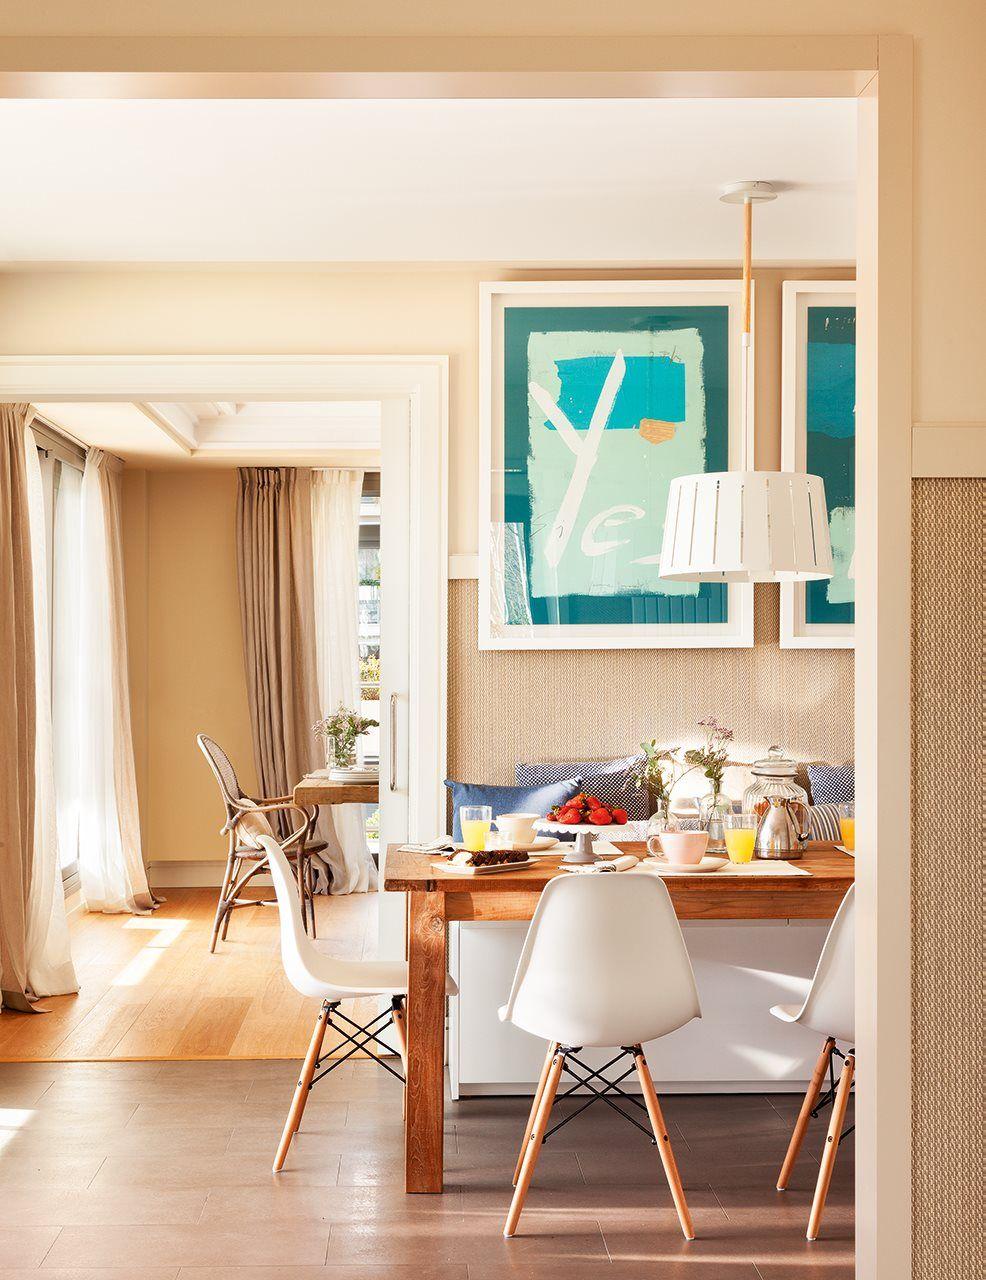 Objetivo: salvar los muebles | Spaces, Coastal and Living rooms